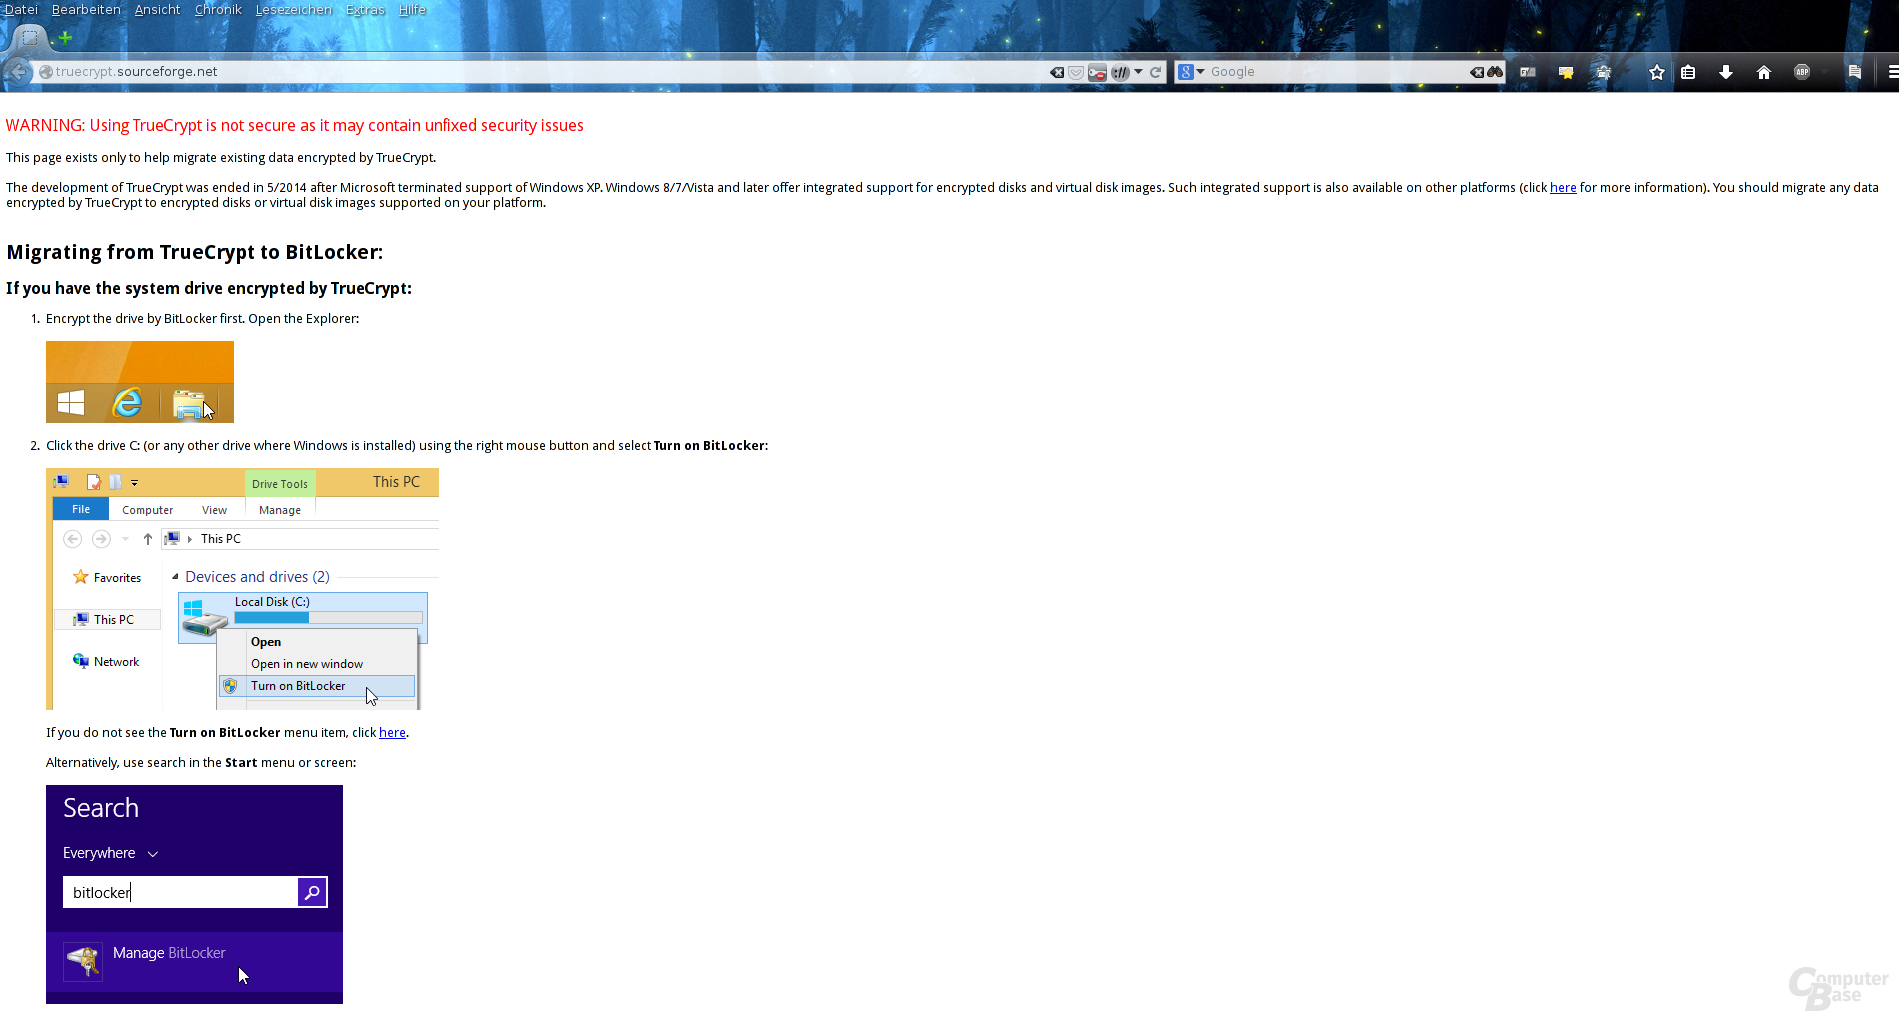 TrueCrypt Webseite